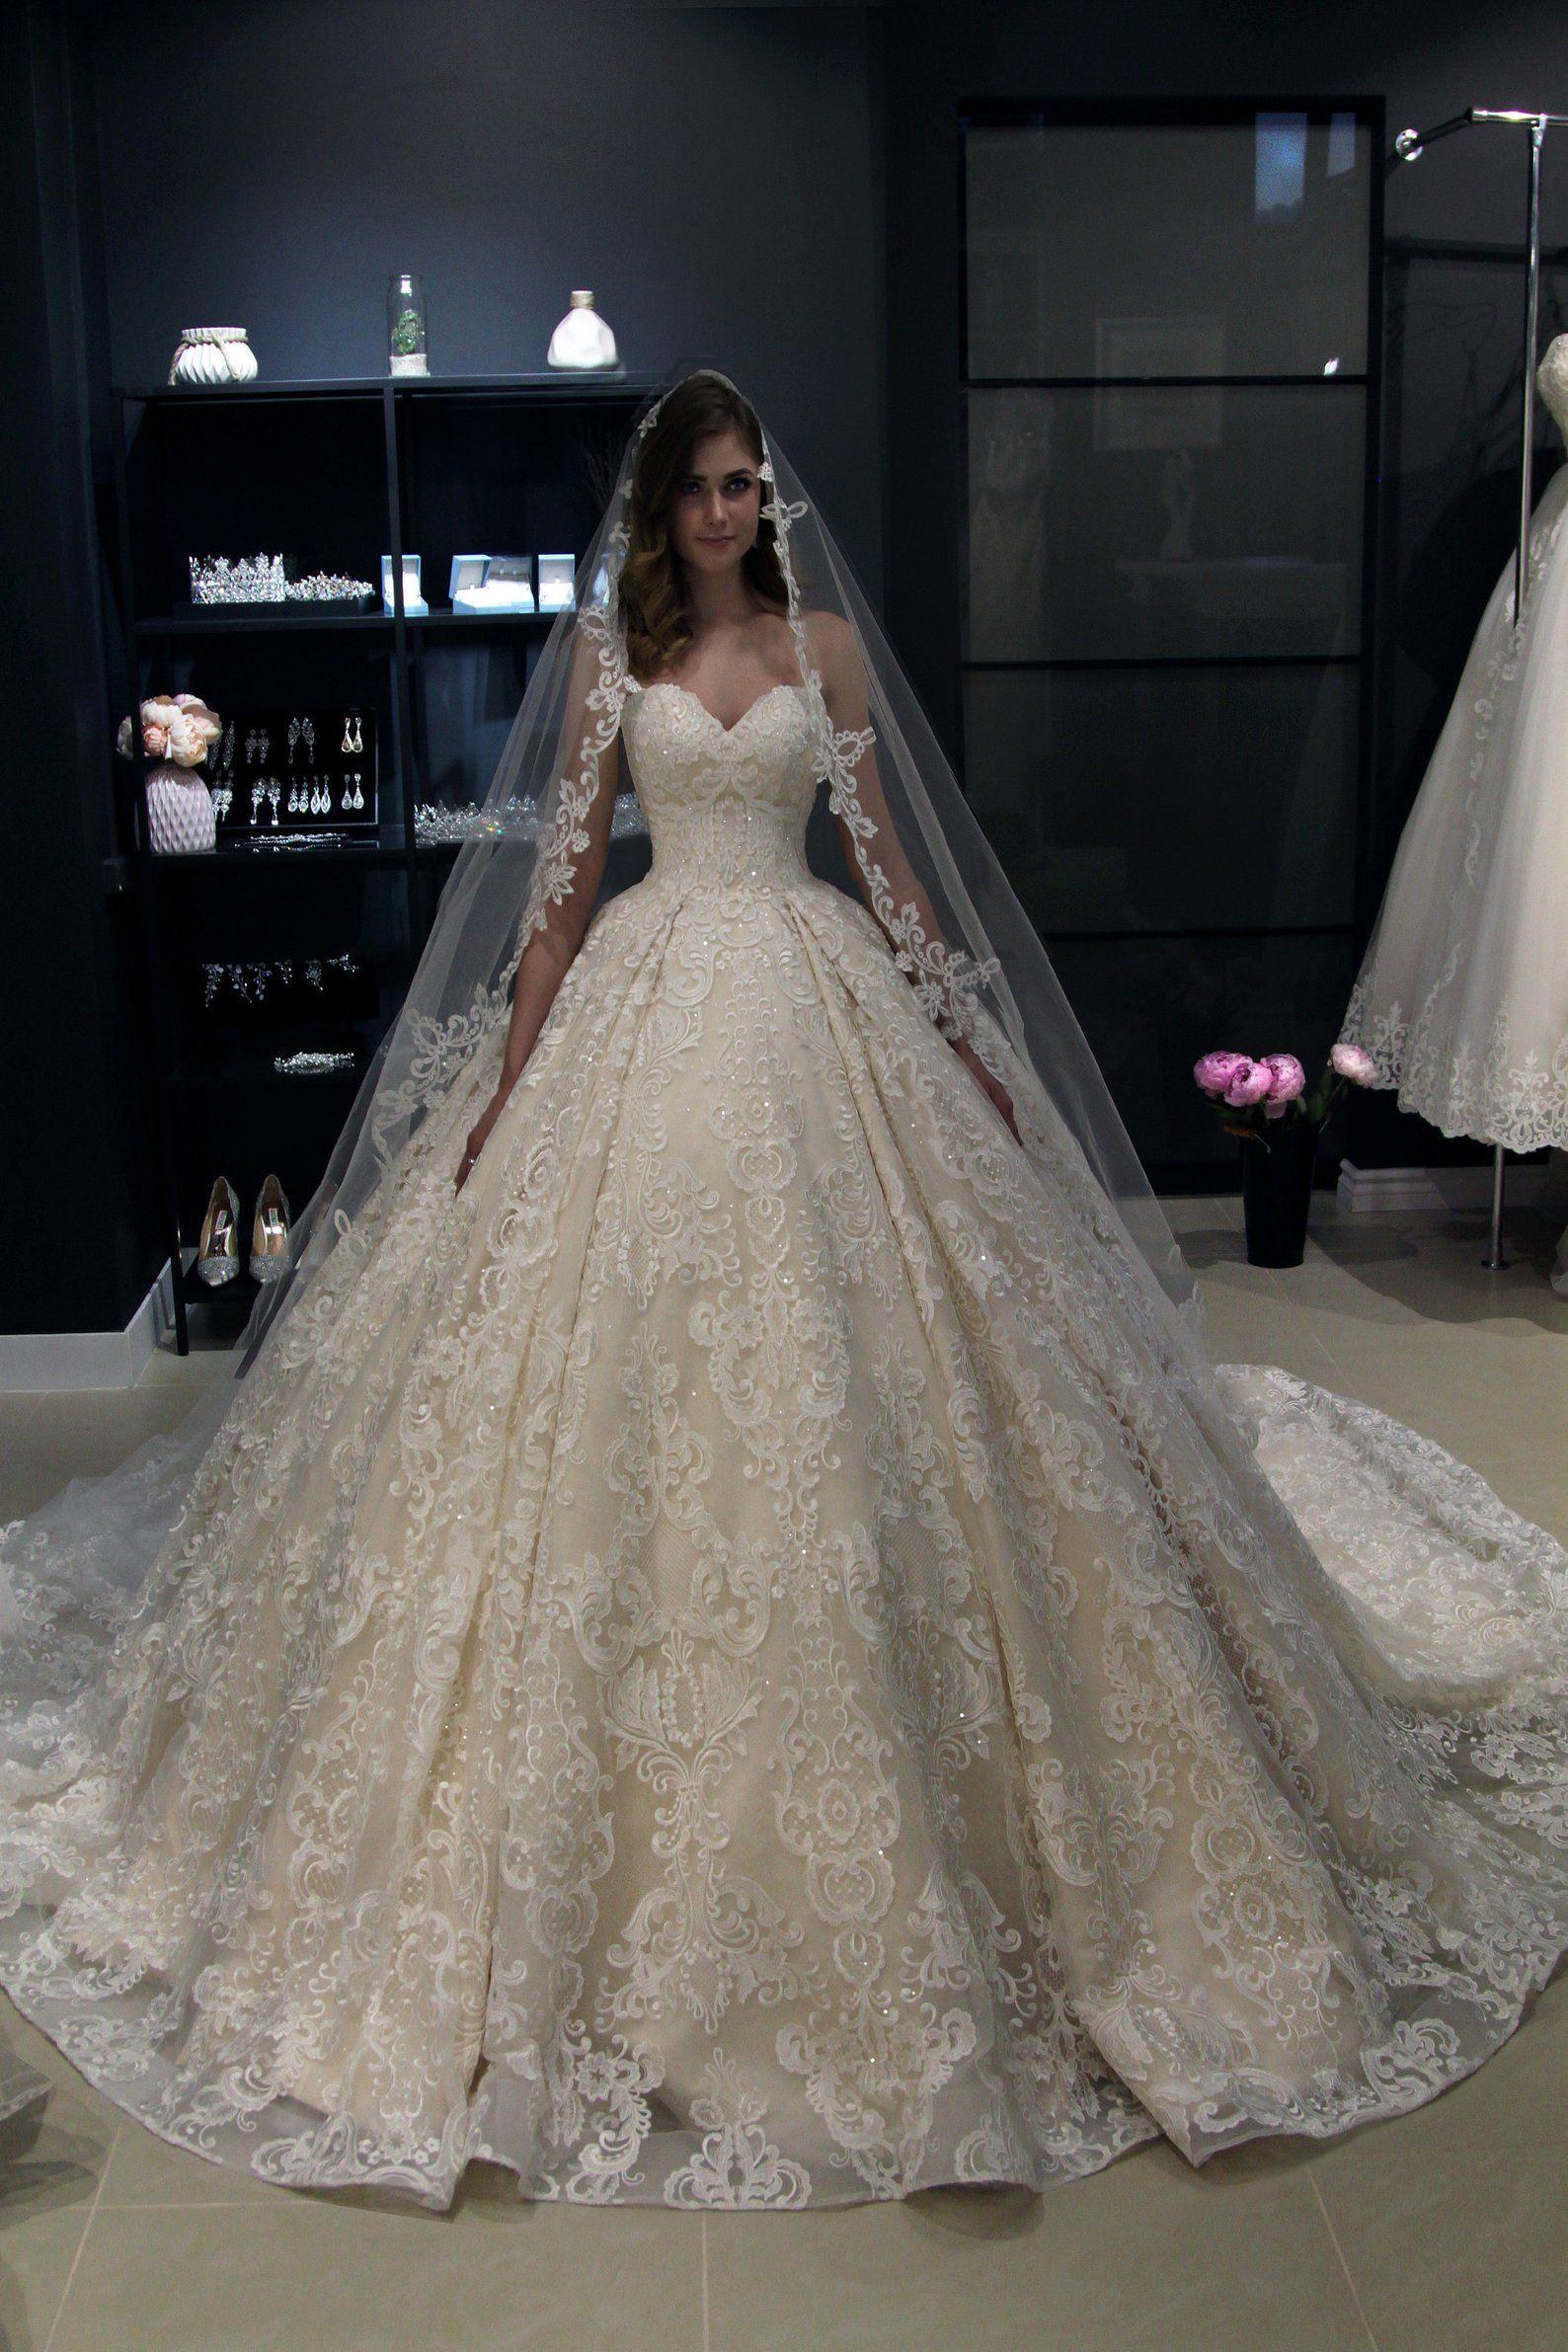 Off The Shoulder Princess Wedding Dress Elmi By Olivia Etsy Wedding Dress Bustier Princess Wedding Dresses Ball Gowns Wedding [ 2382 x 1588 Pixel ]